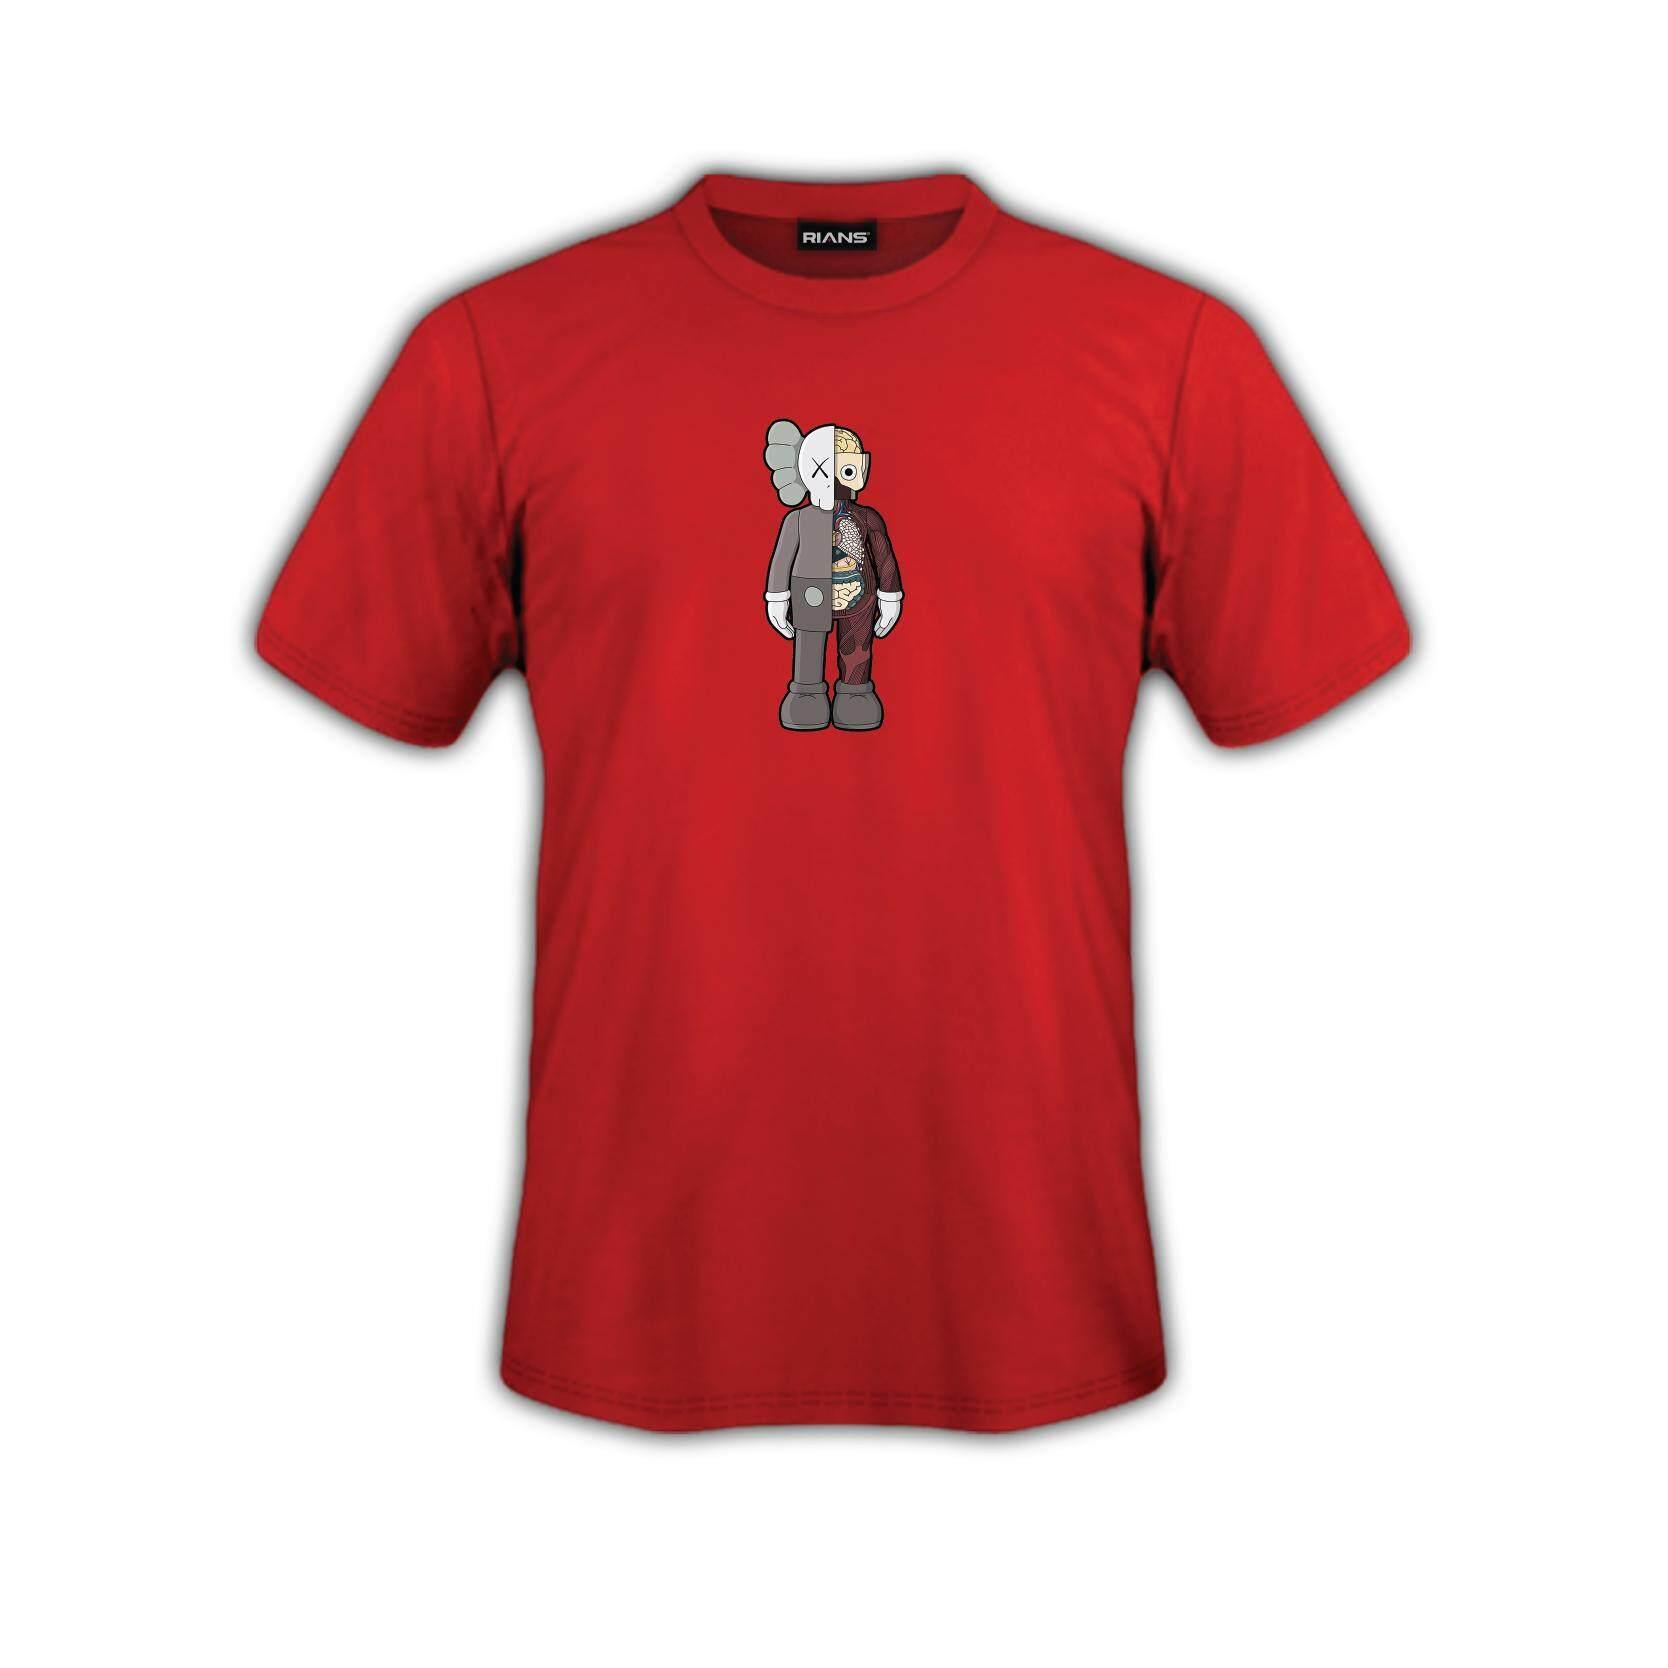 T-Shirt KAWS Berdiri  Viral 4 Colour 100% Cotton Baju Tshirt Black White Hitam Putih Bossku